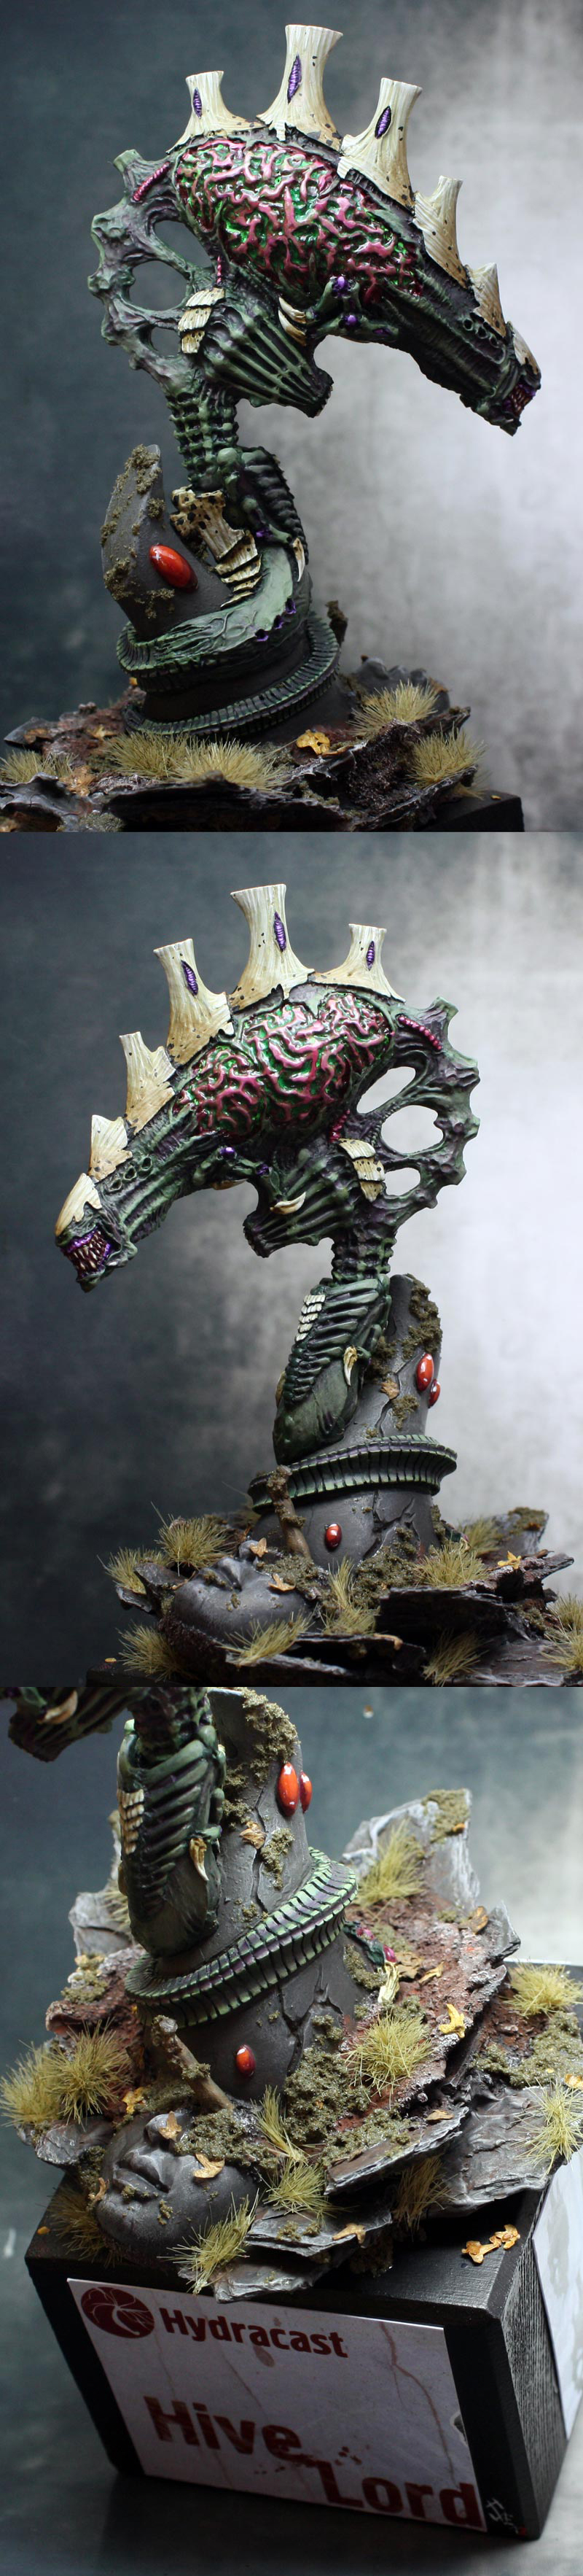 Tyranid Doom of Malan'tai Hydracast Hive Overlord